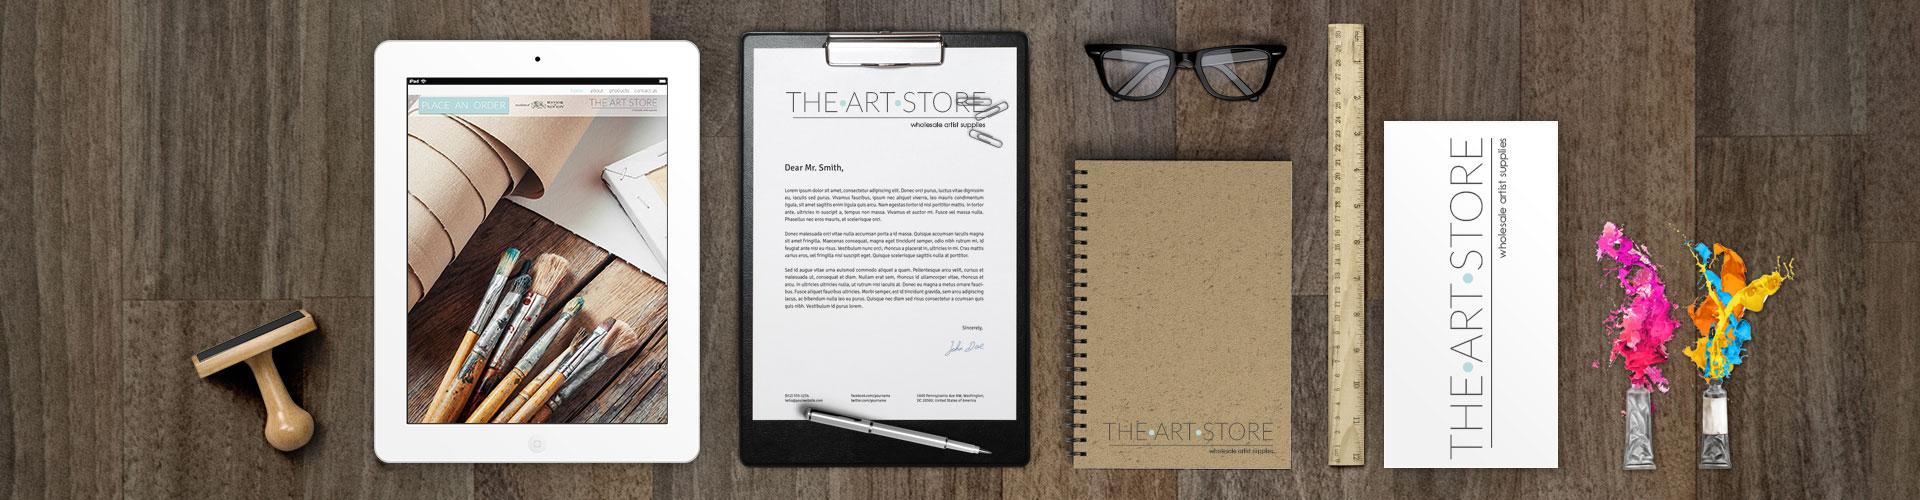 art-stores-img-banner